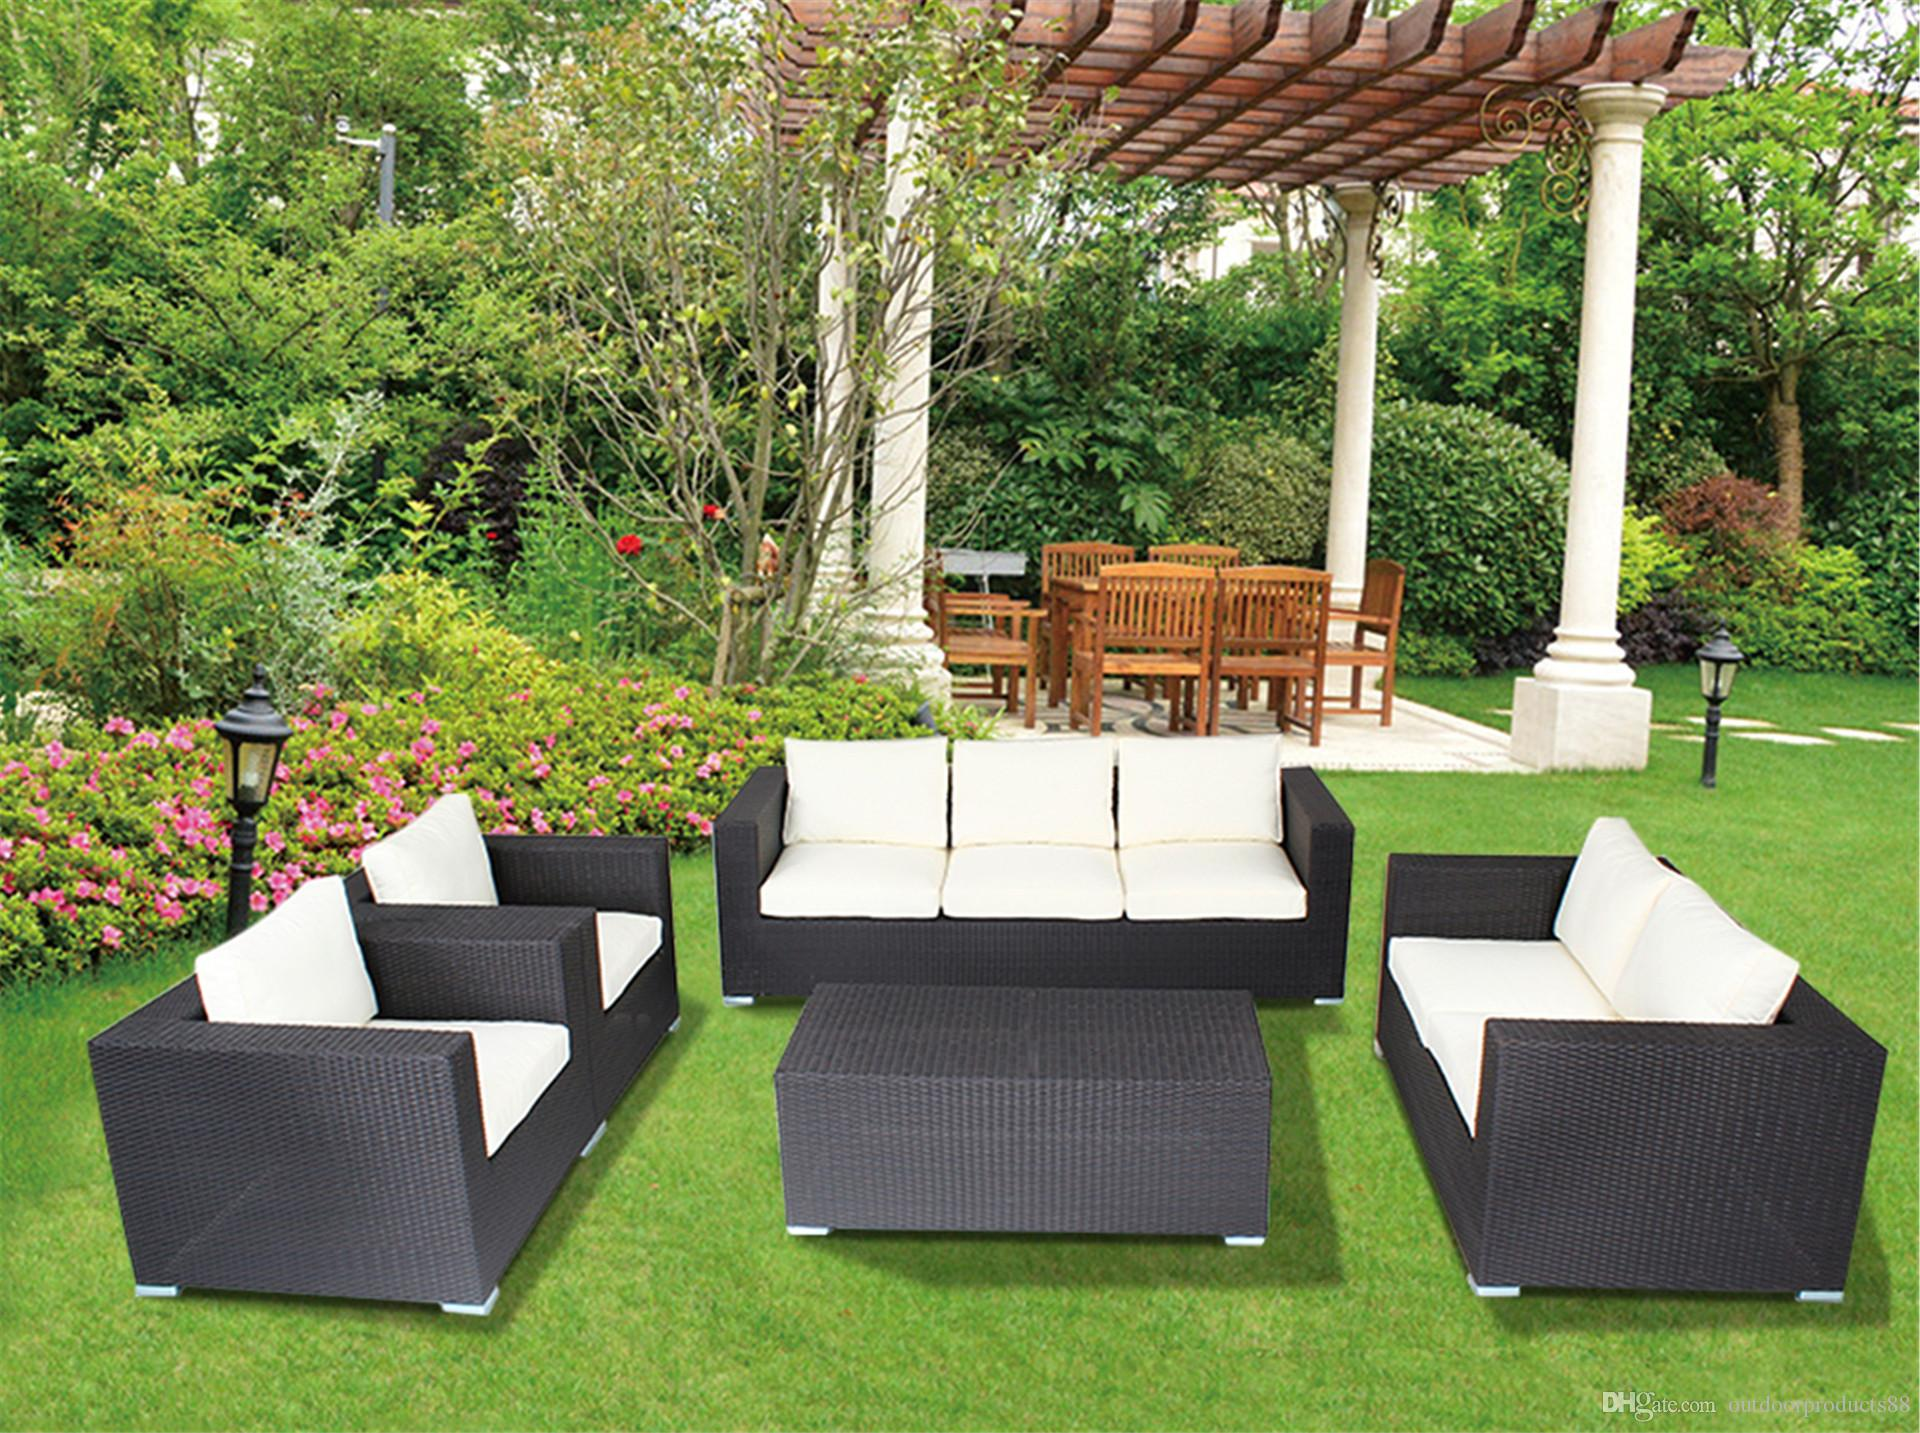 FashionGarden Outdoor Furniture Rattan Sofa Set Outdoor Leisure